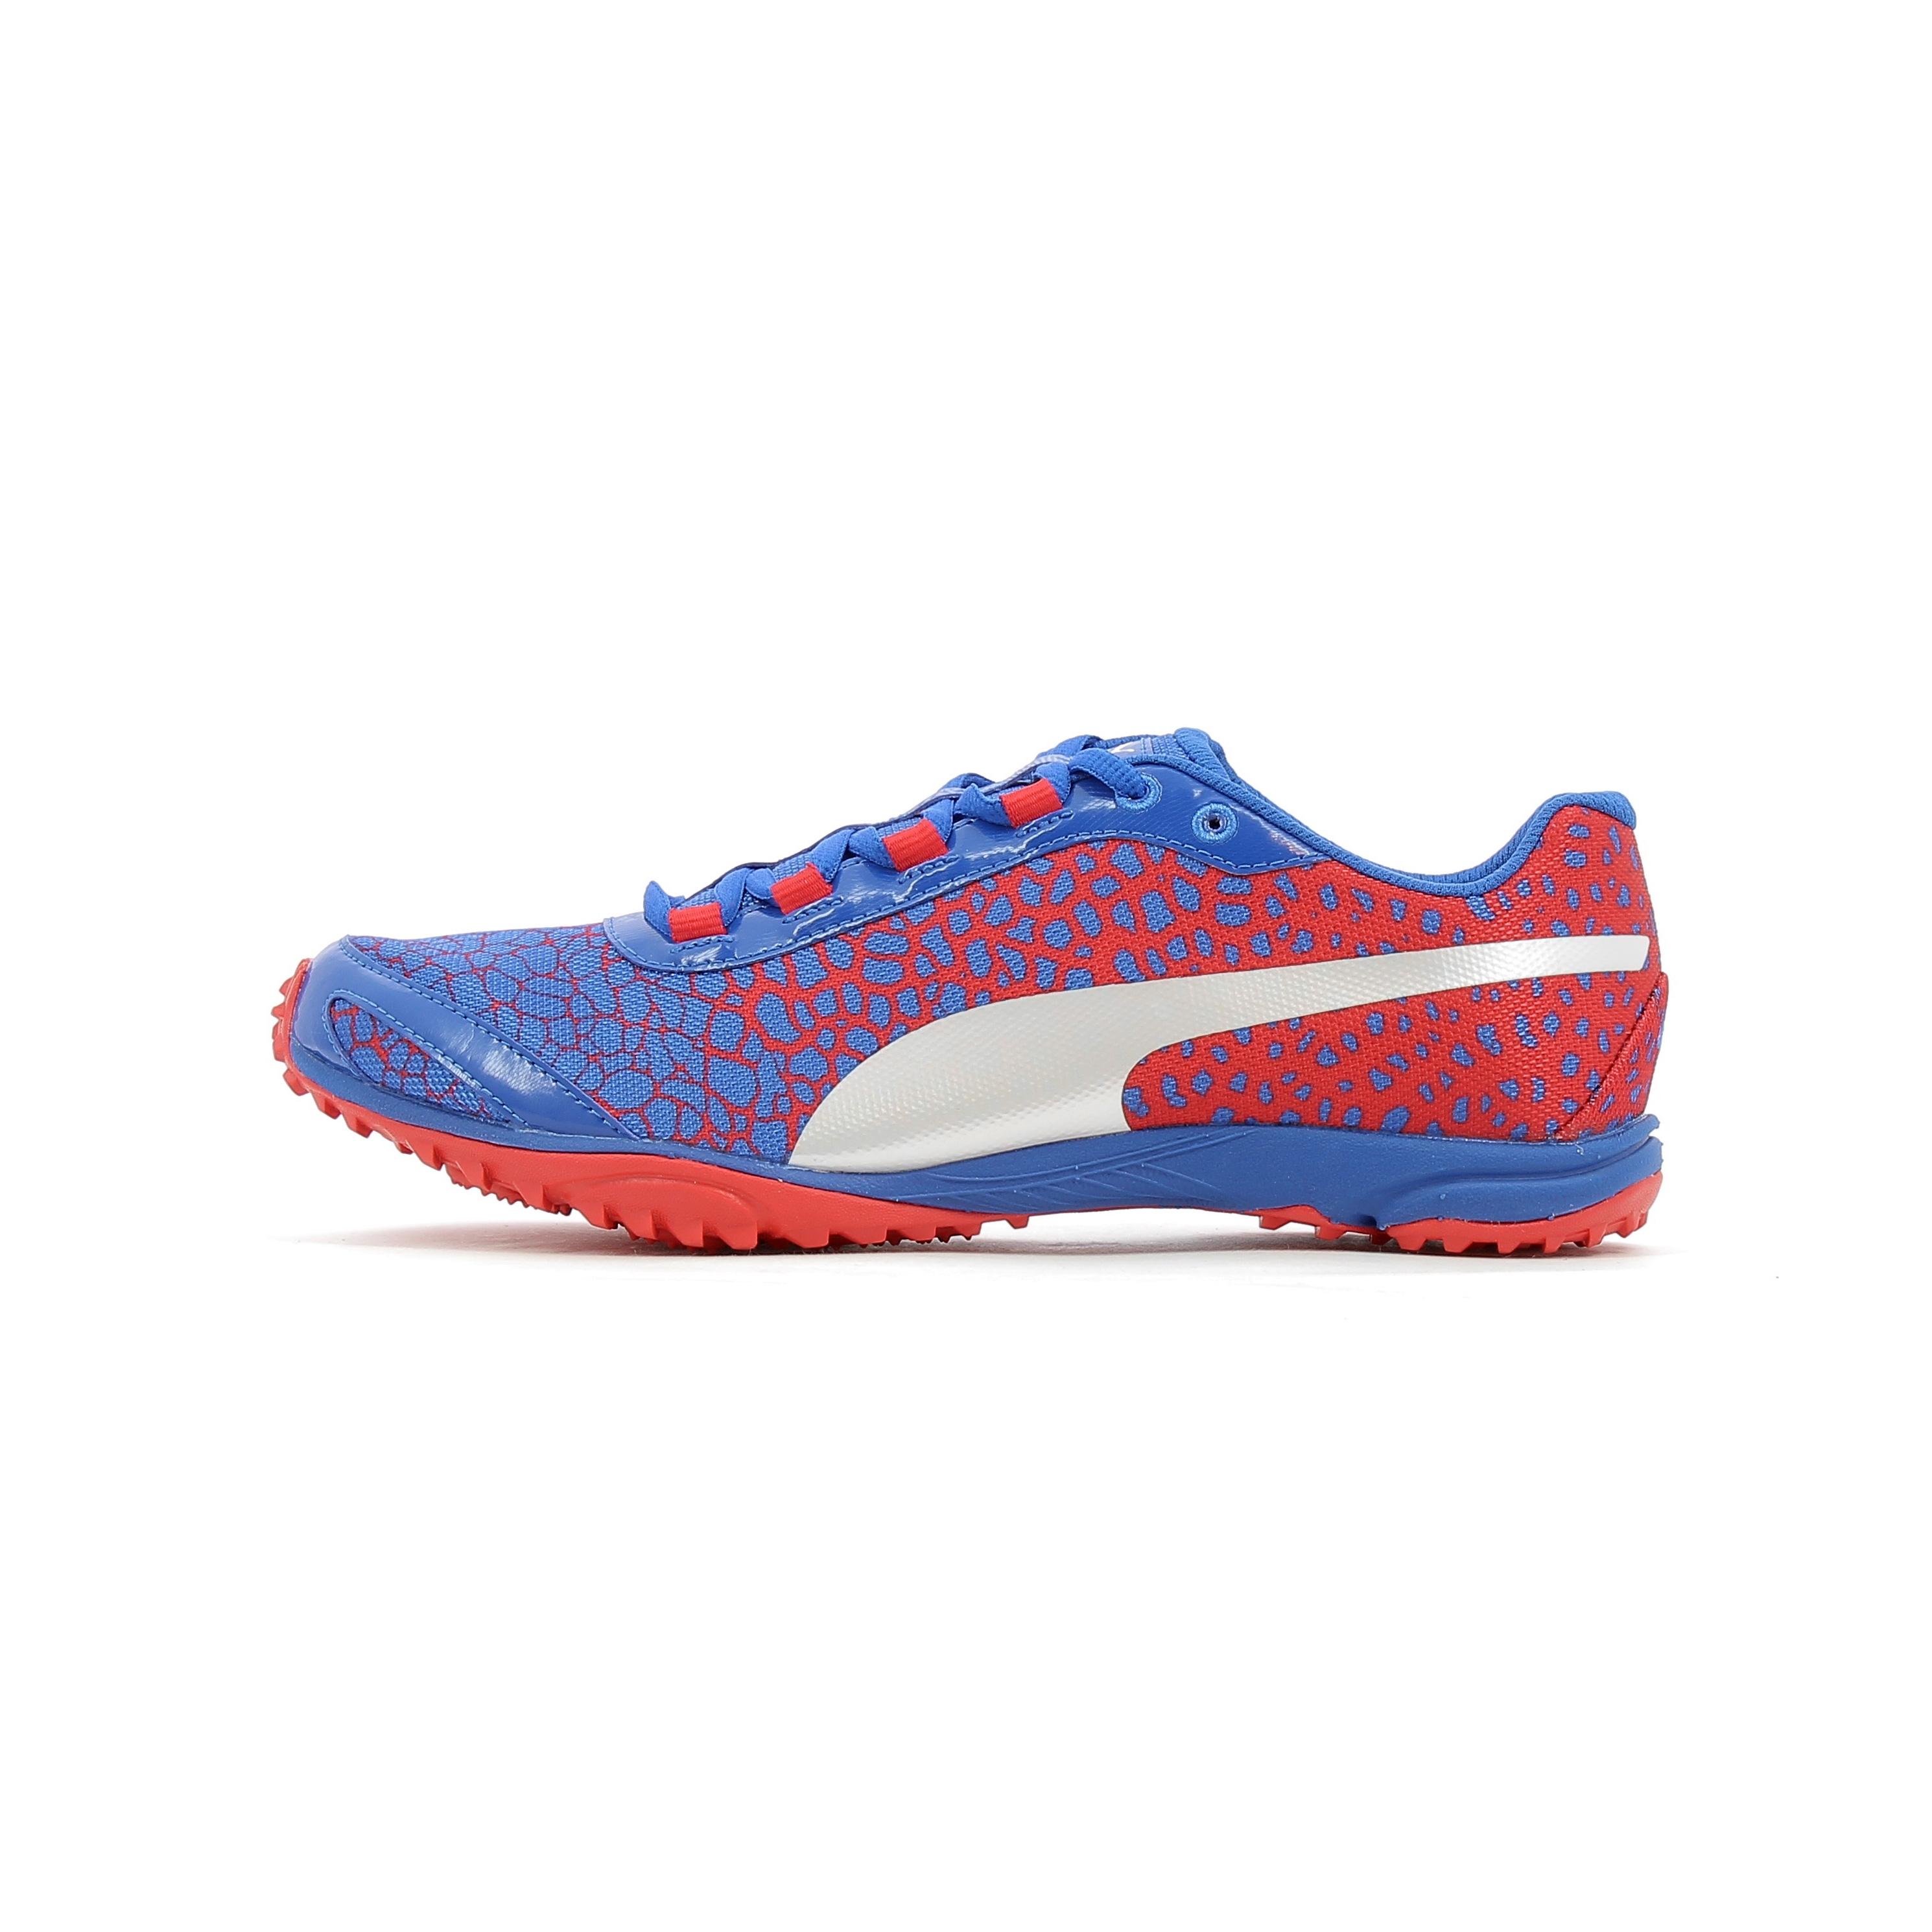 Puma Chaussures à pointes d'athlétisme EvoSpeed Haraka 4 5QOJ4xNWUz